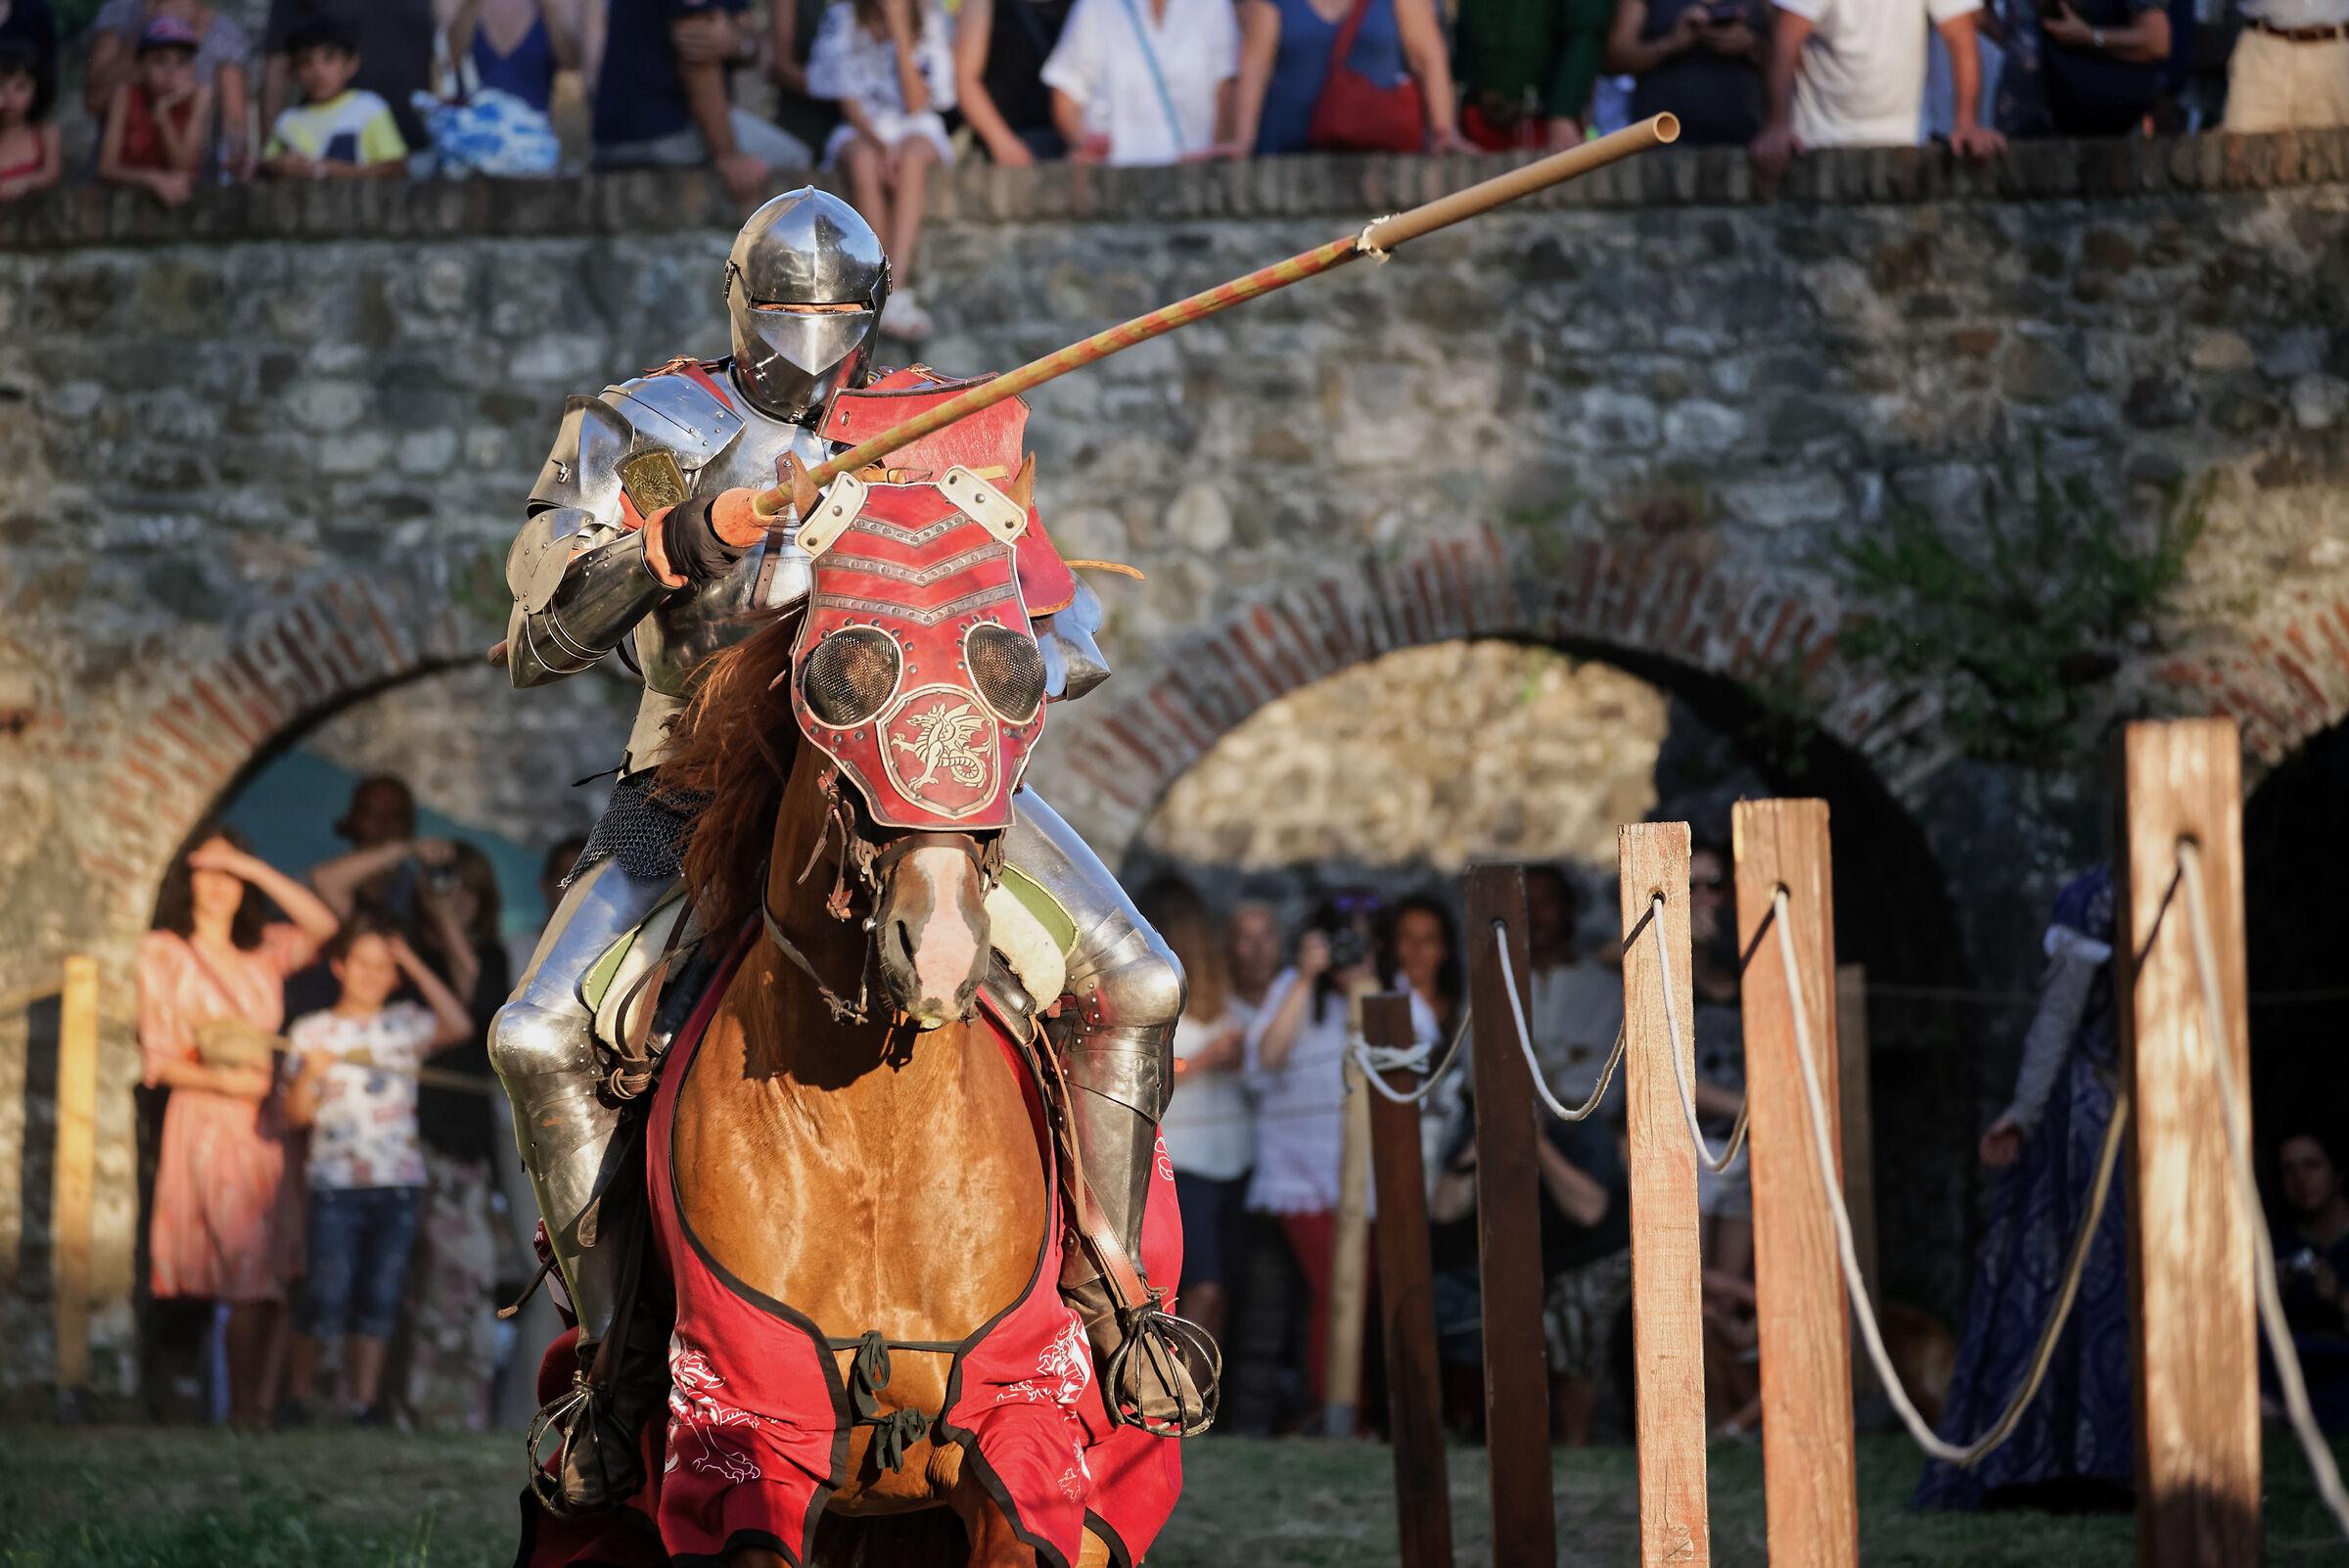 Giostra Medioevale a cavallo II...